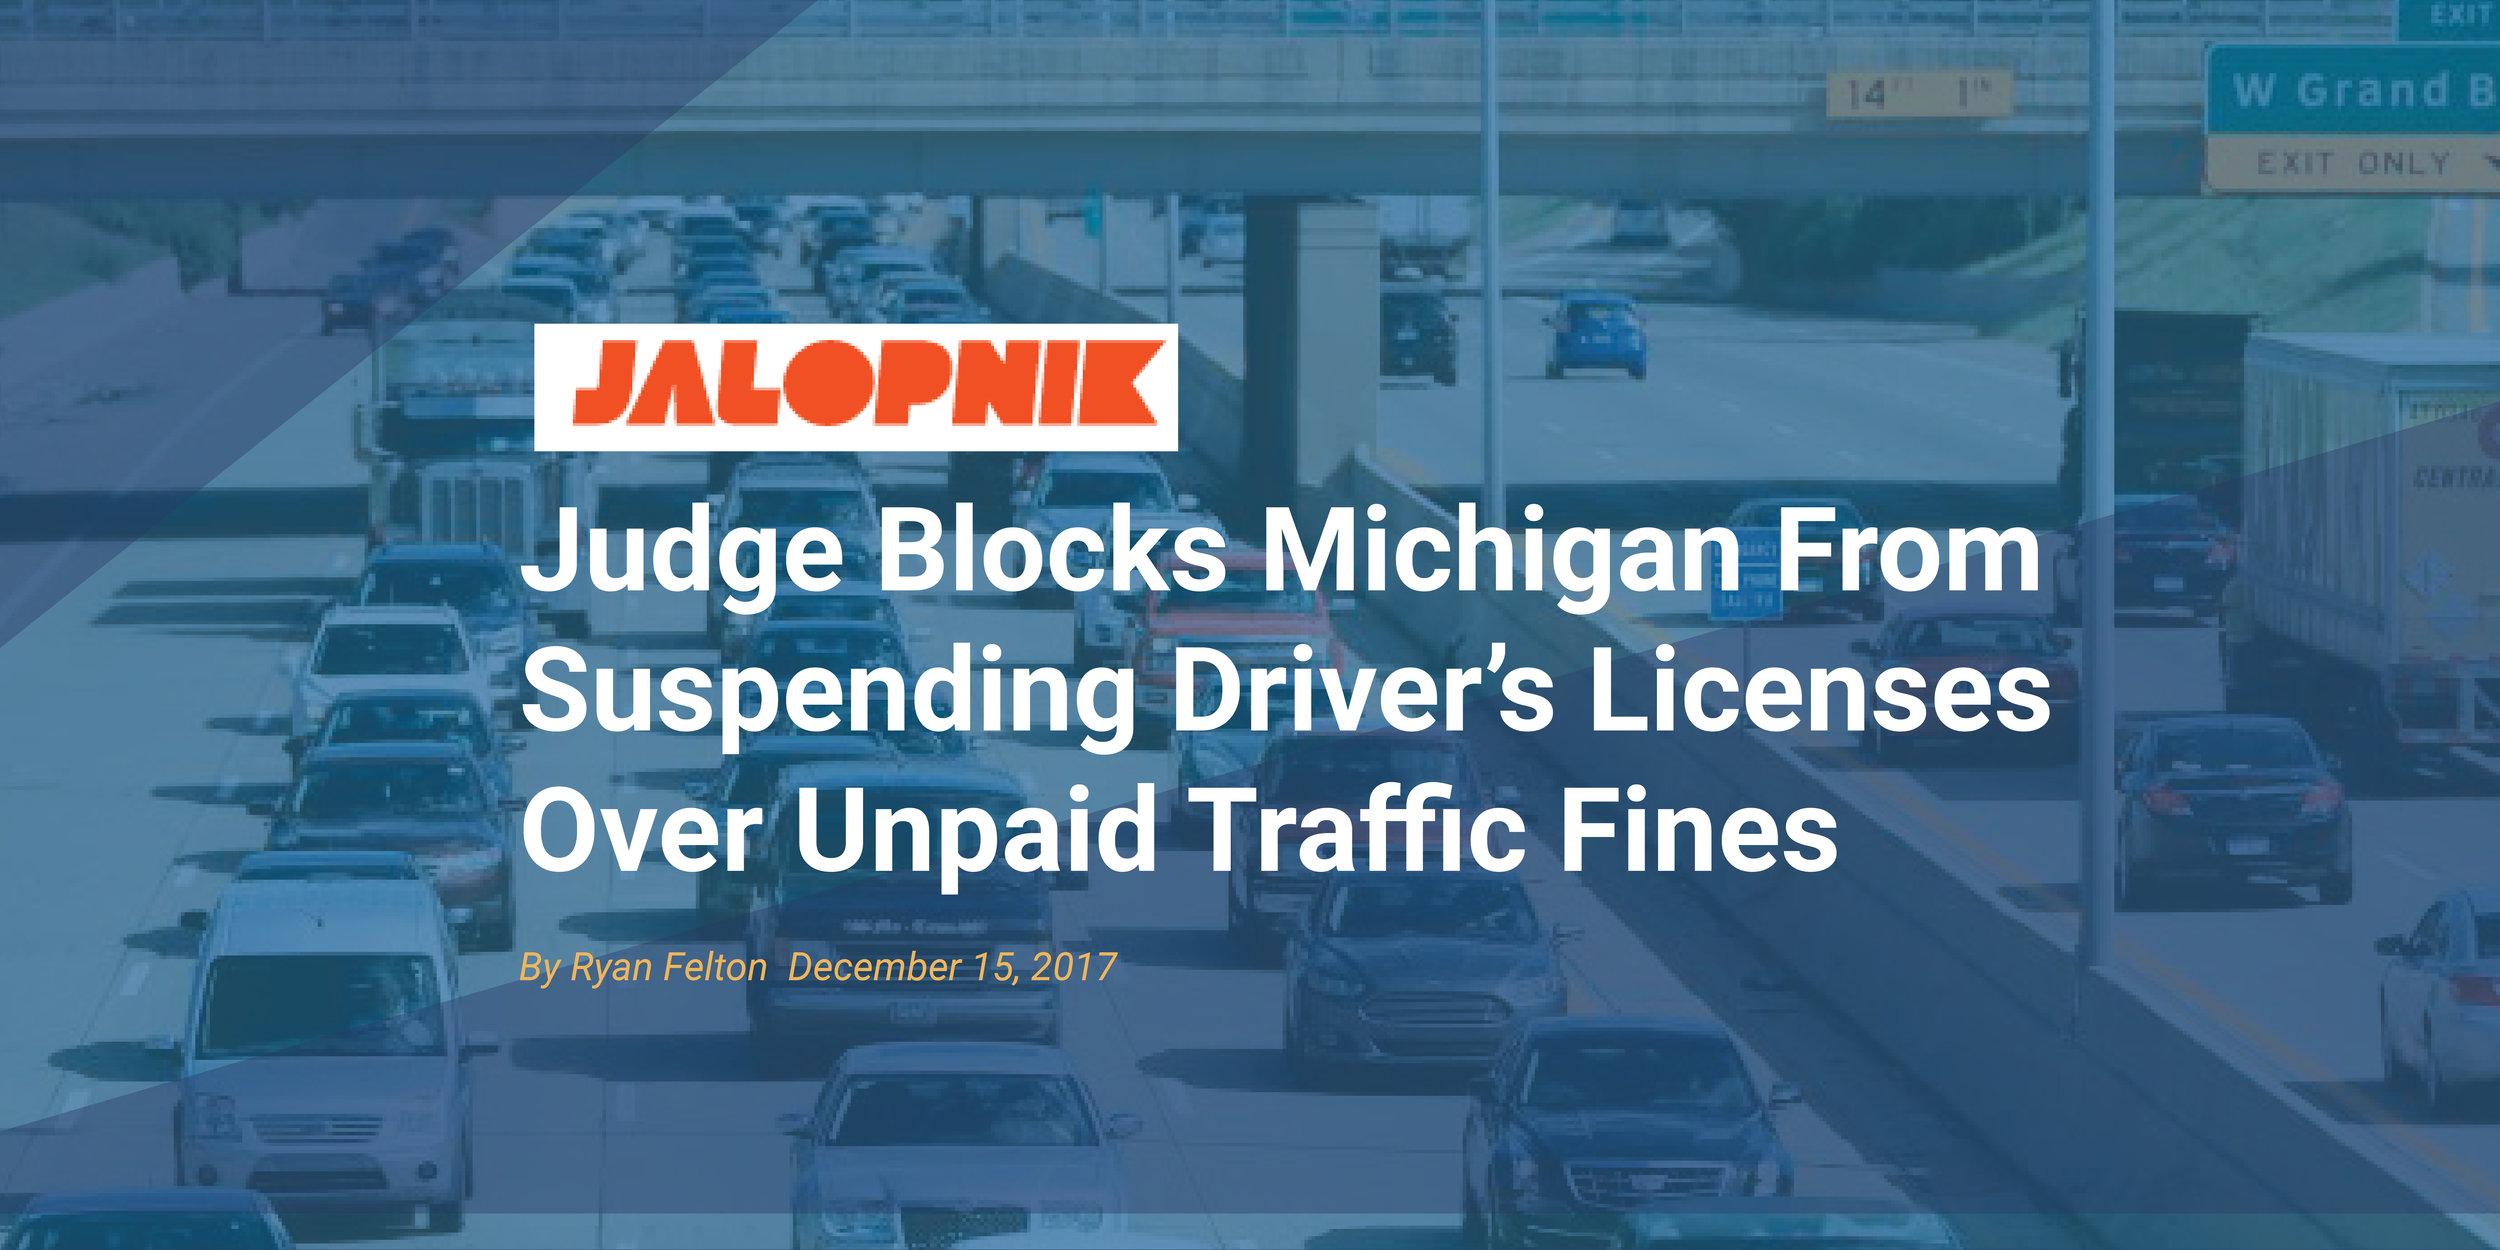 Drivers License Fowler News4.jpg